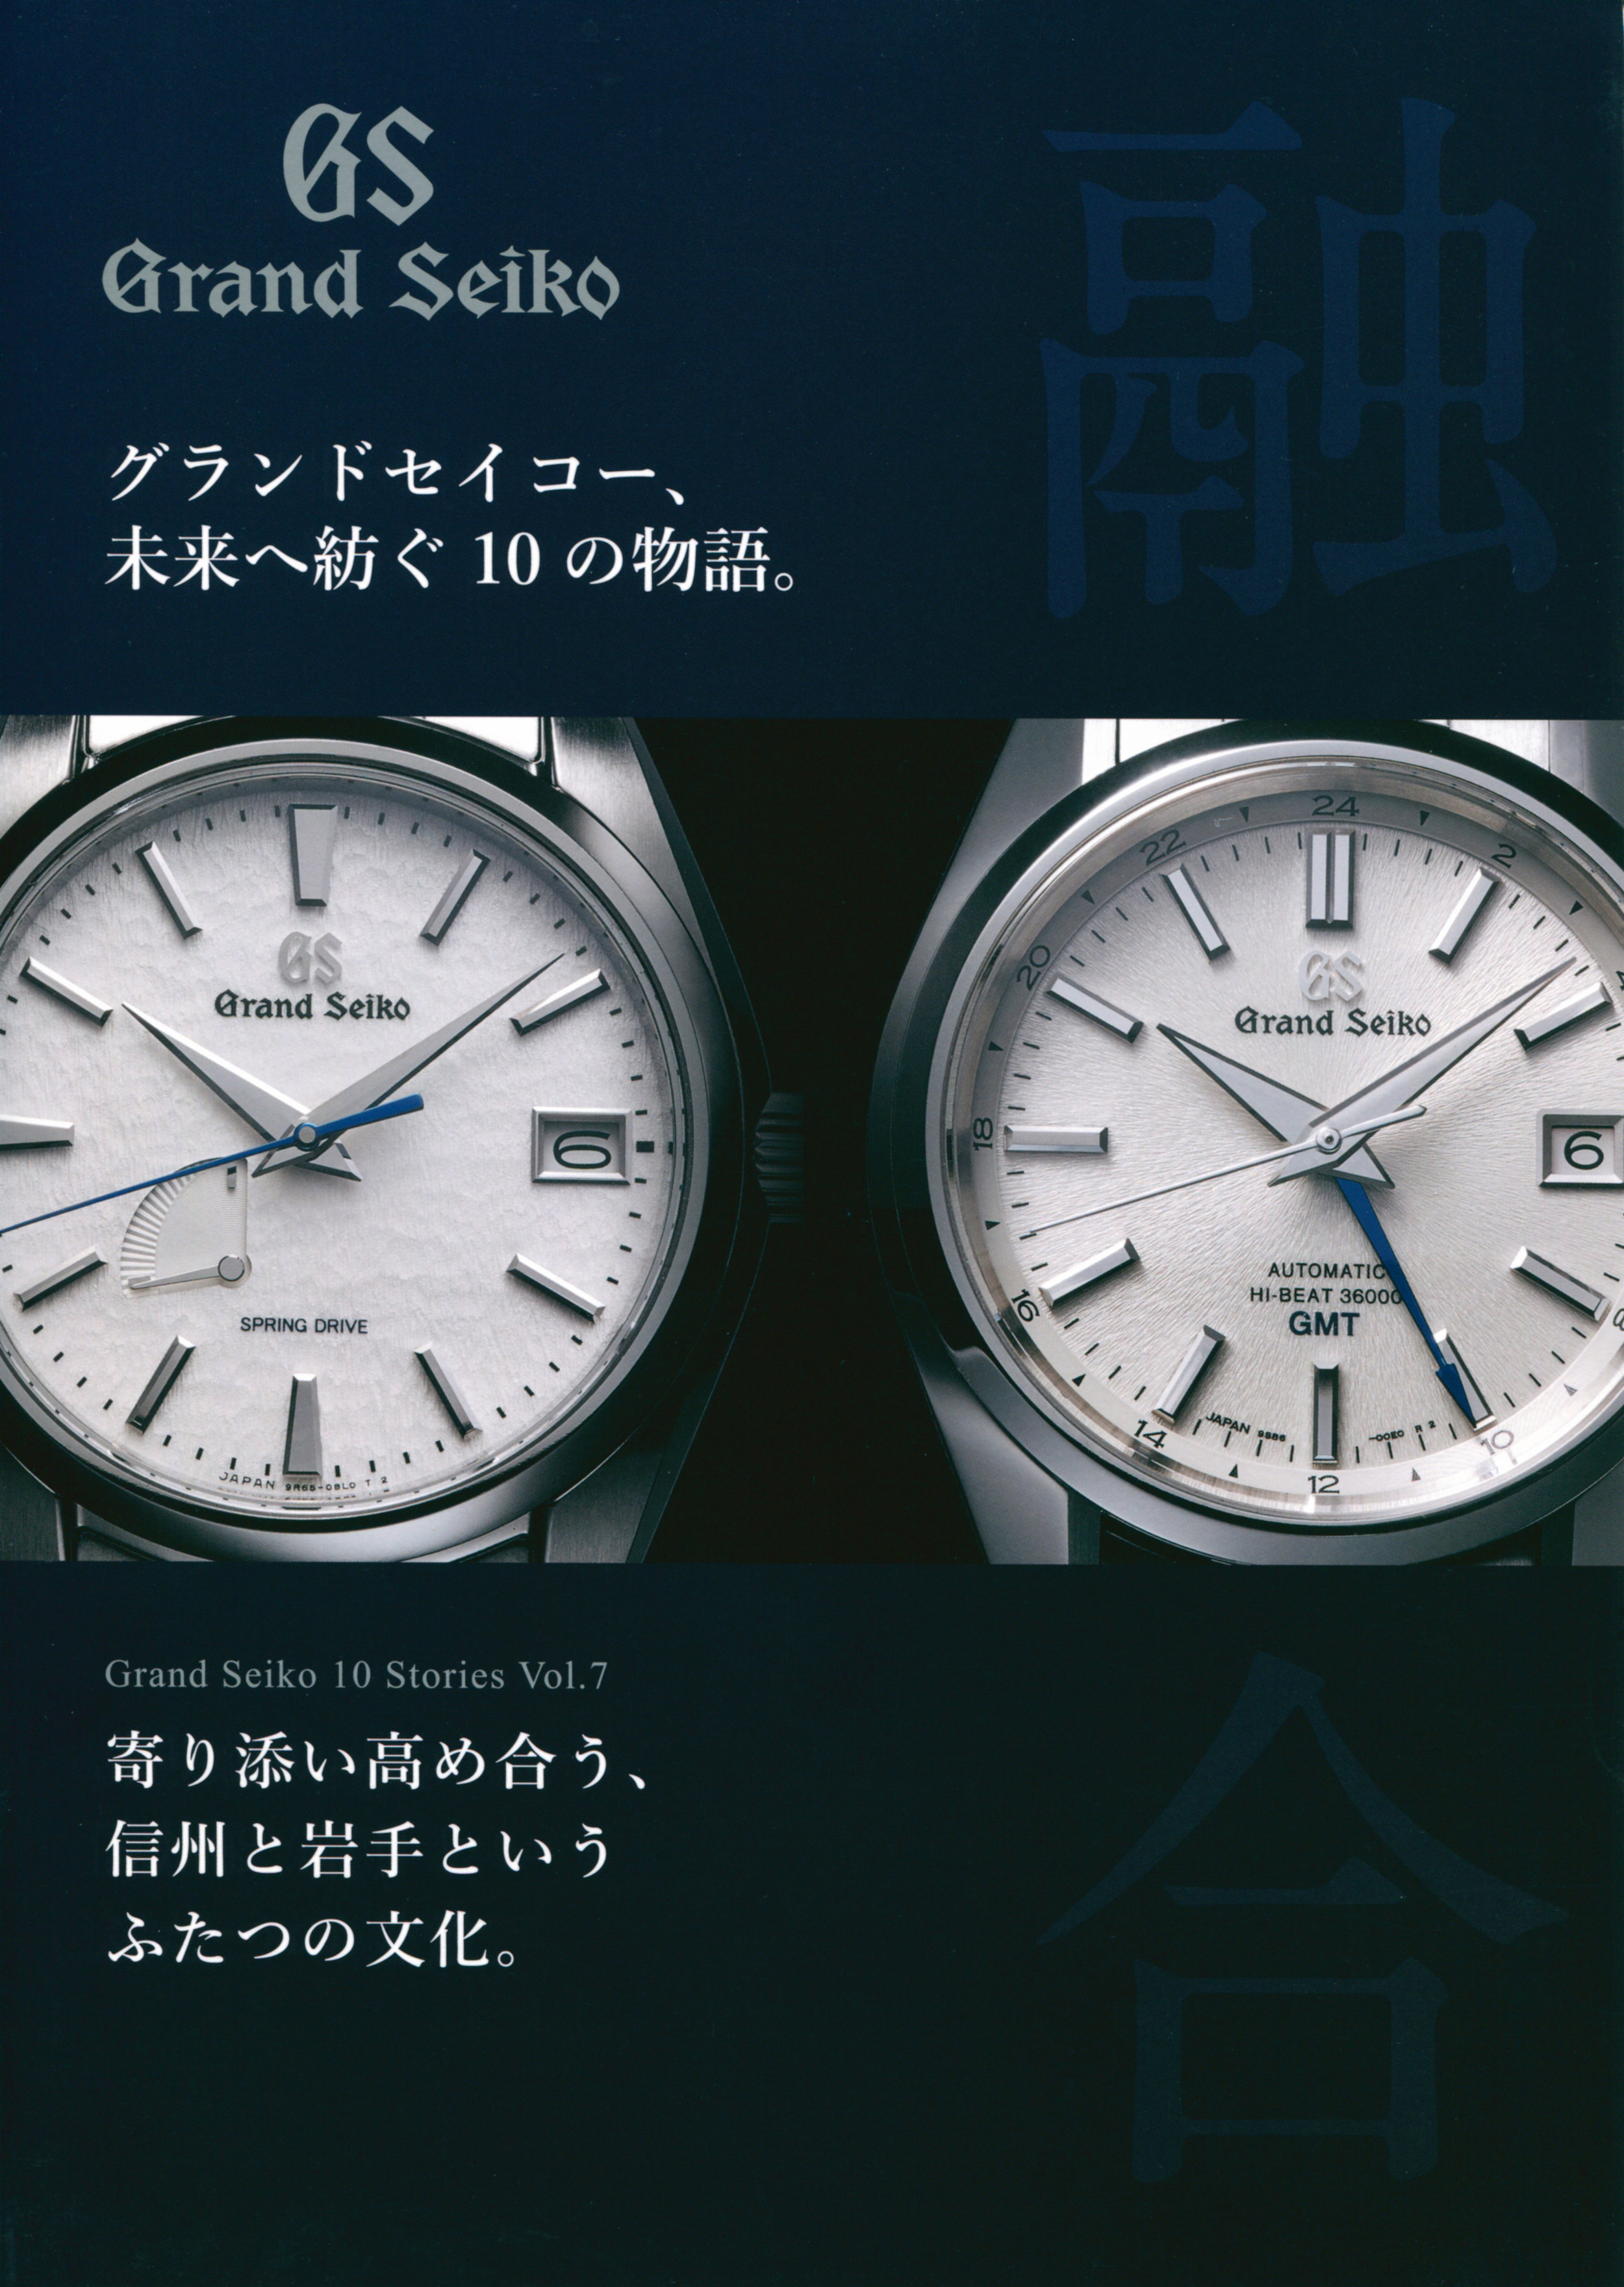 Grand Seiko 10 Stories Vol.7